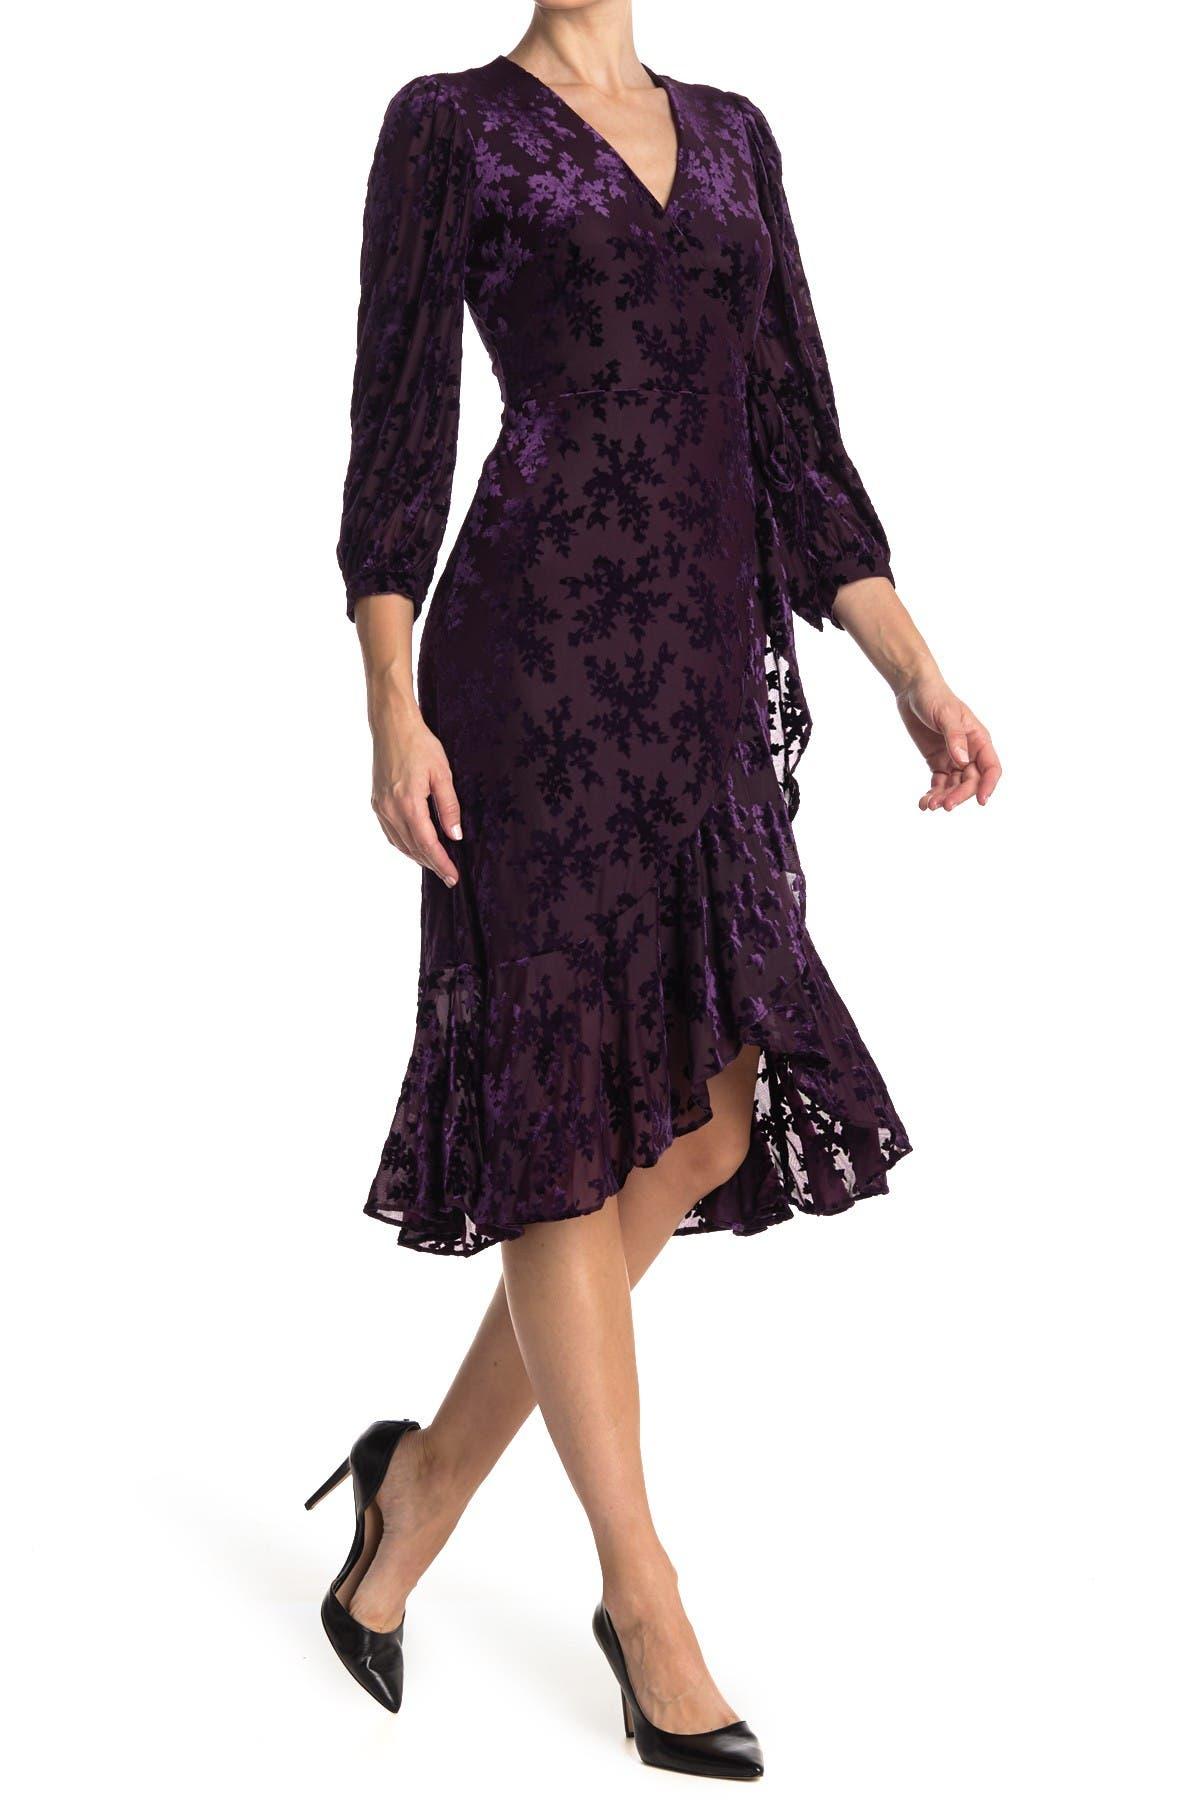 Image of Calvin Klein Velvet Burnout Surplus Dress